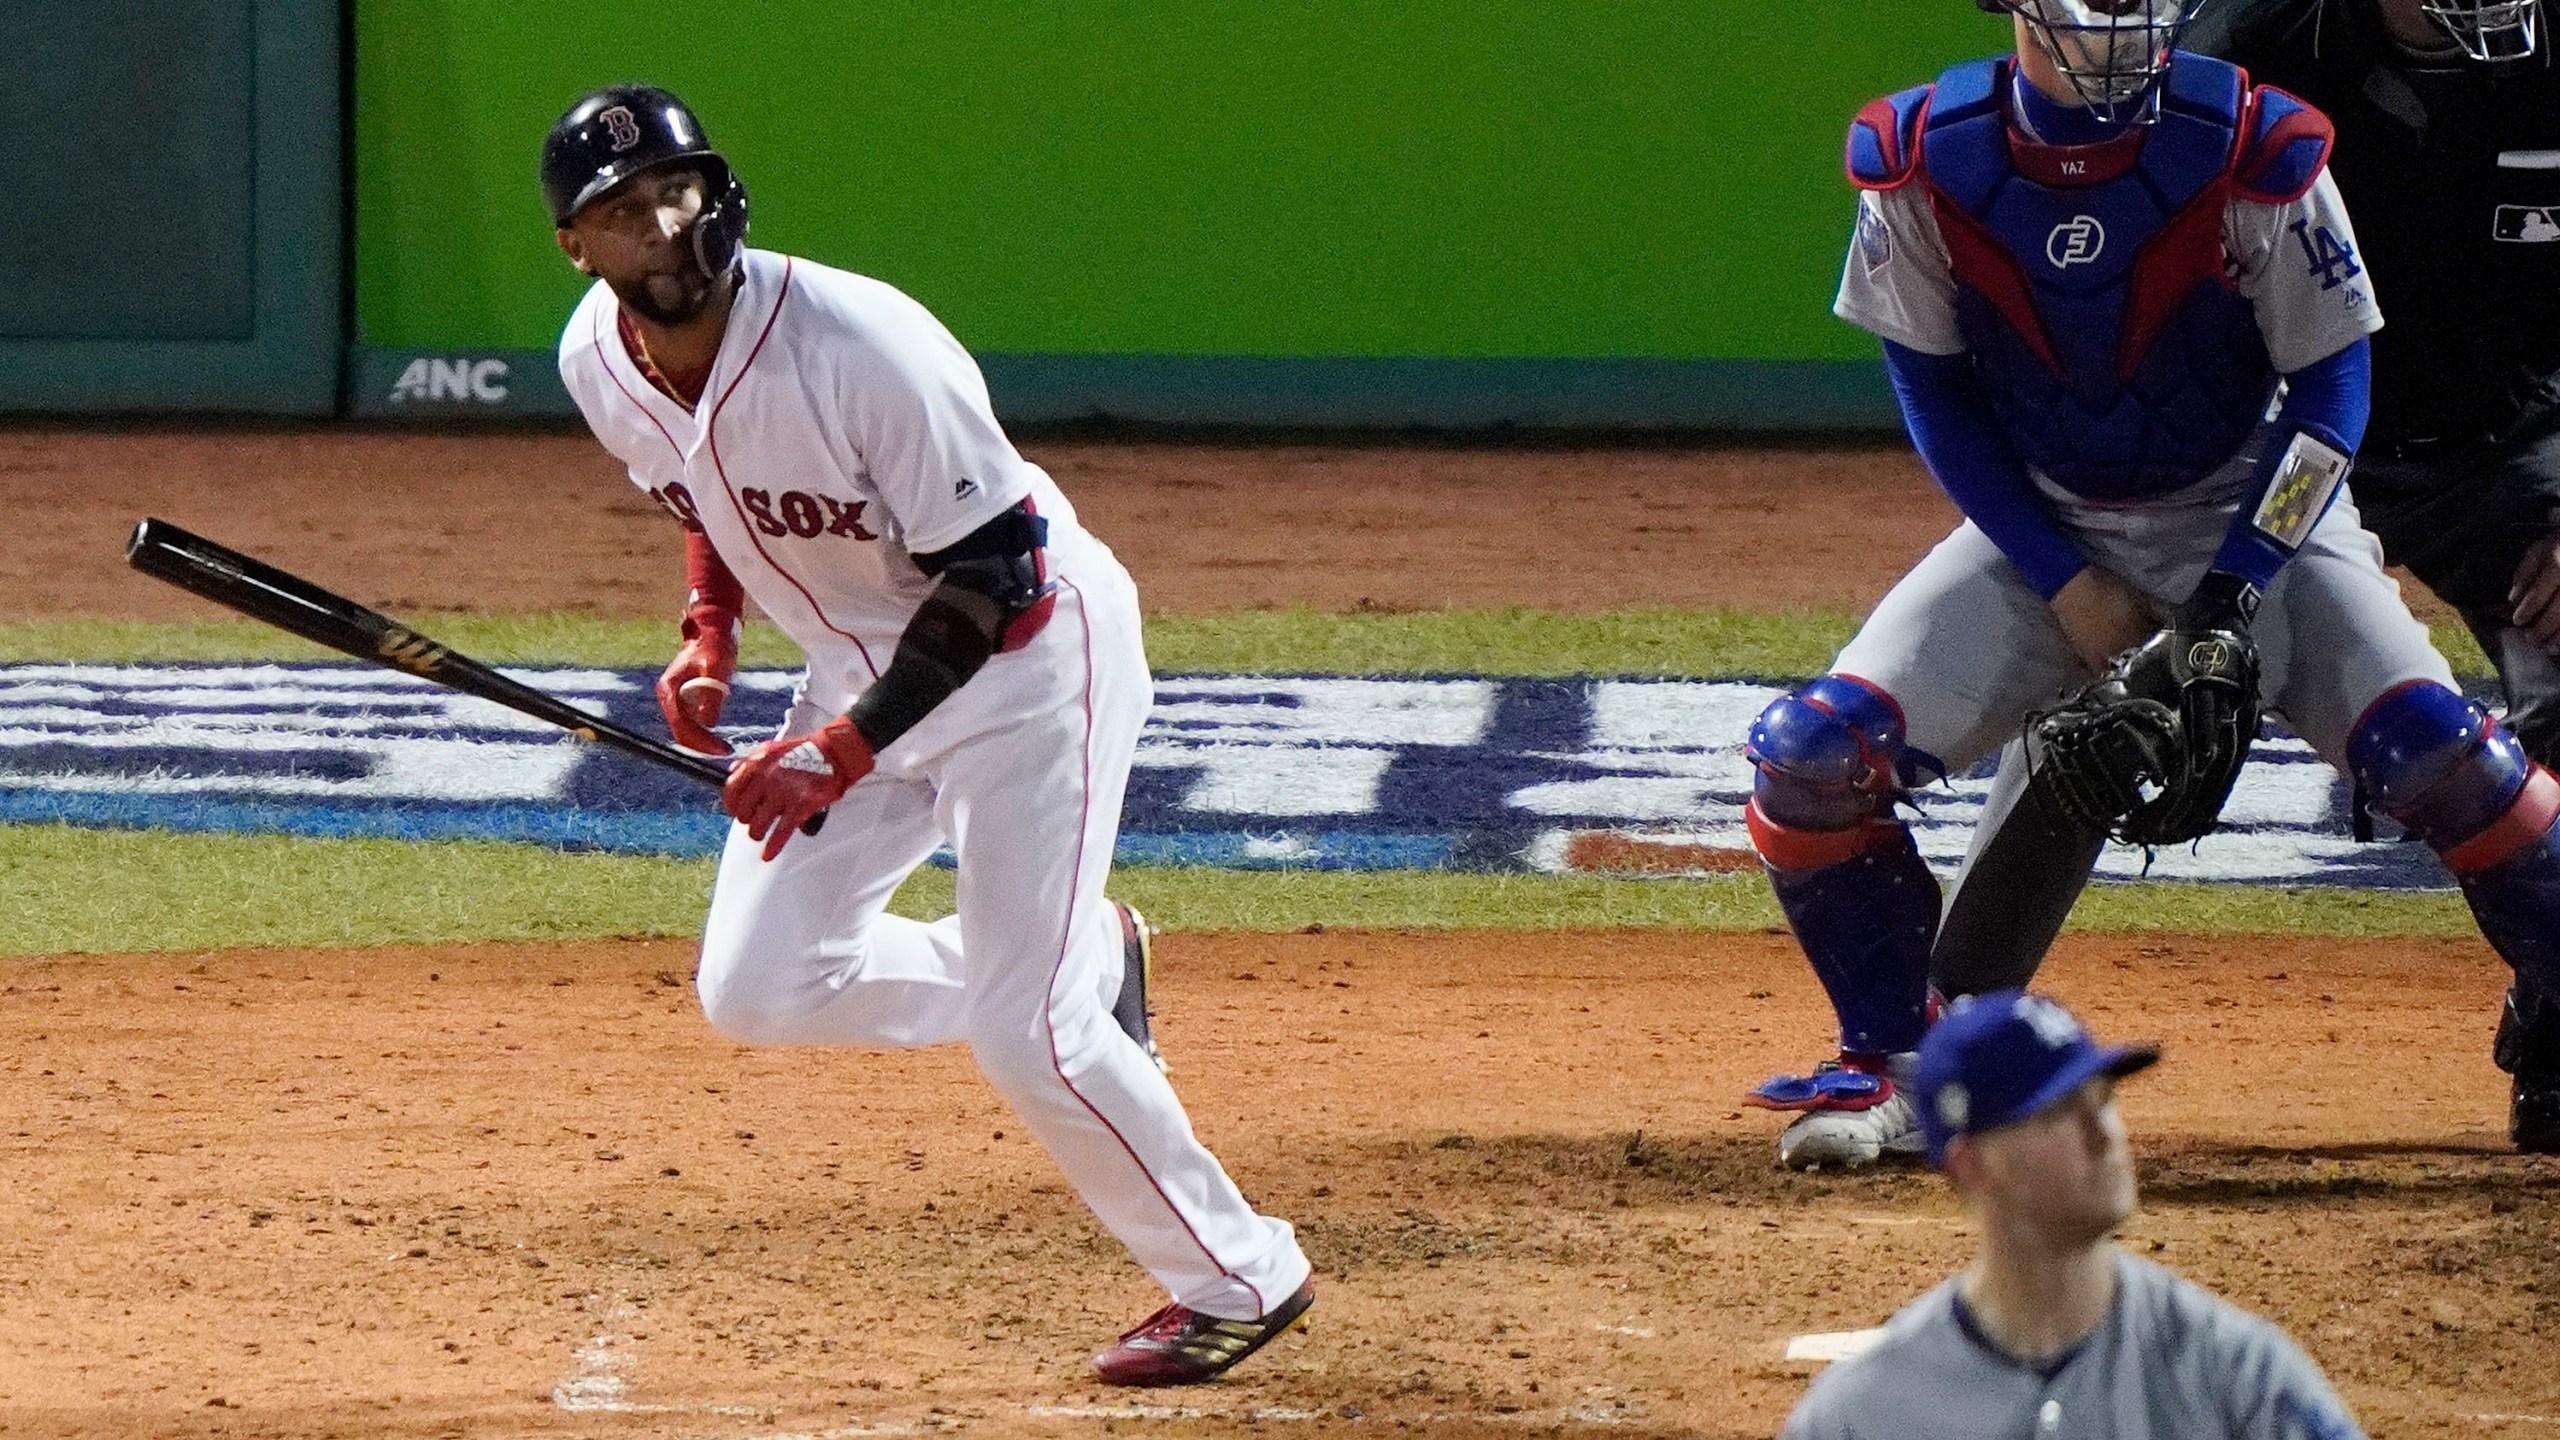 World_Series_Dodgers_Red_Sox_Baseball_16170-159532.jpg54244993